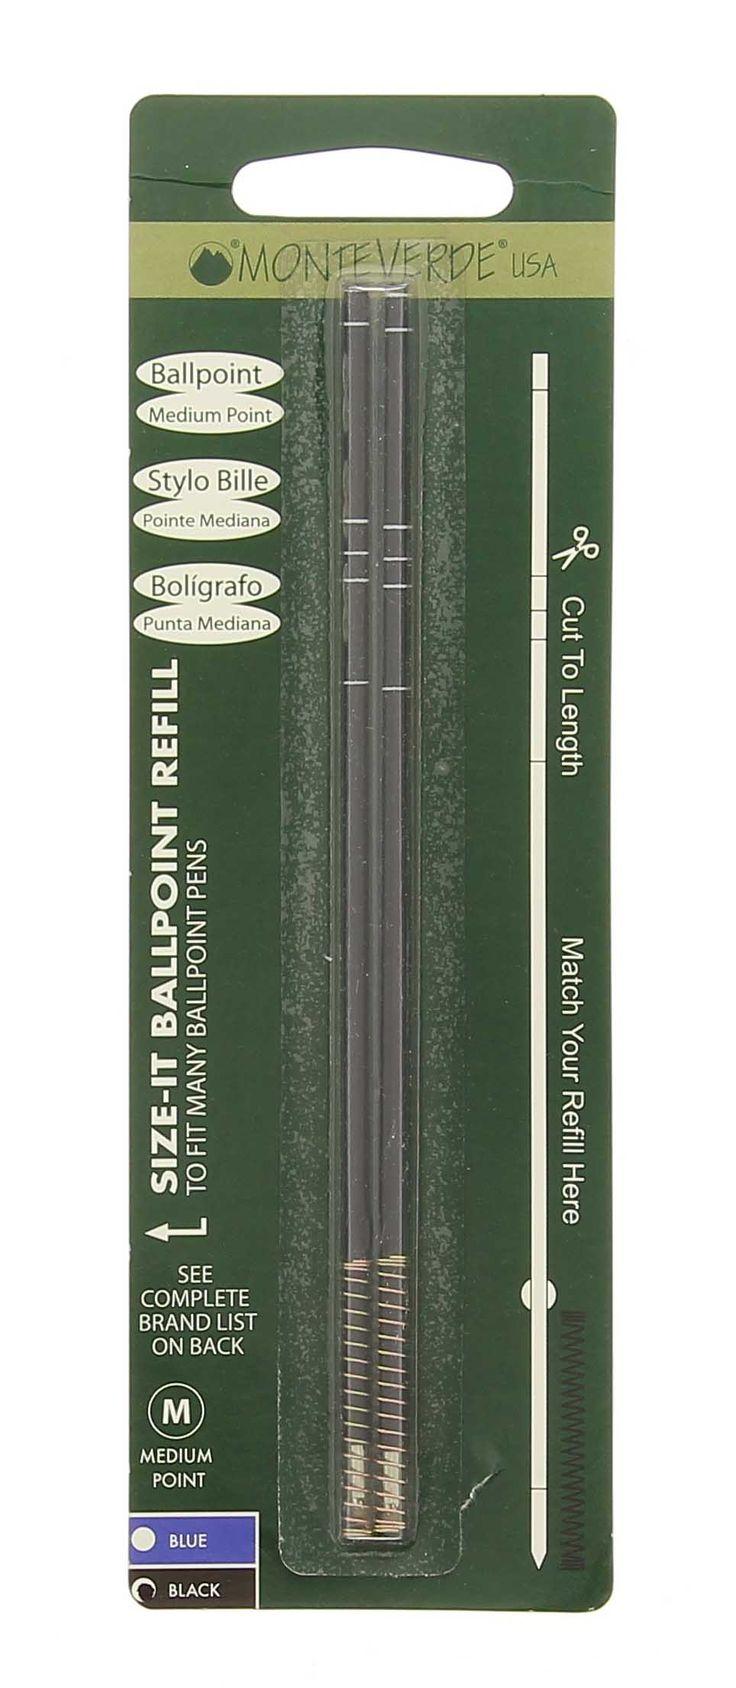 Recharge bille universelle Monteverde noire x 2 : achat recharge stylo